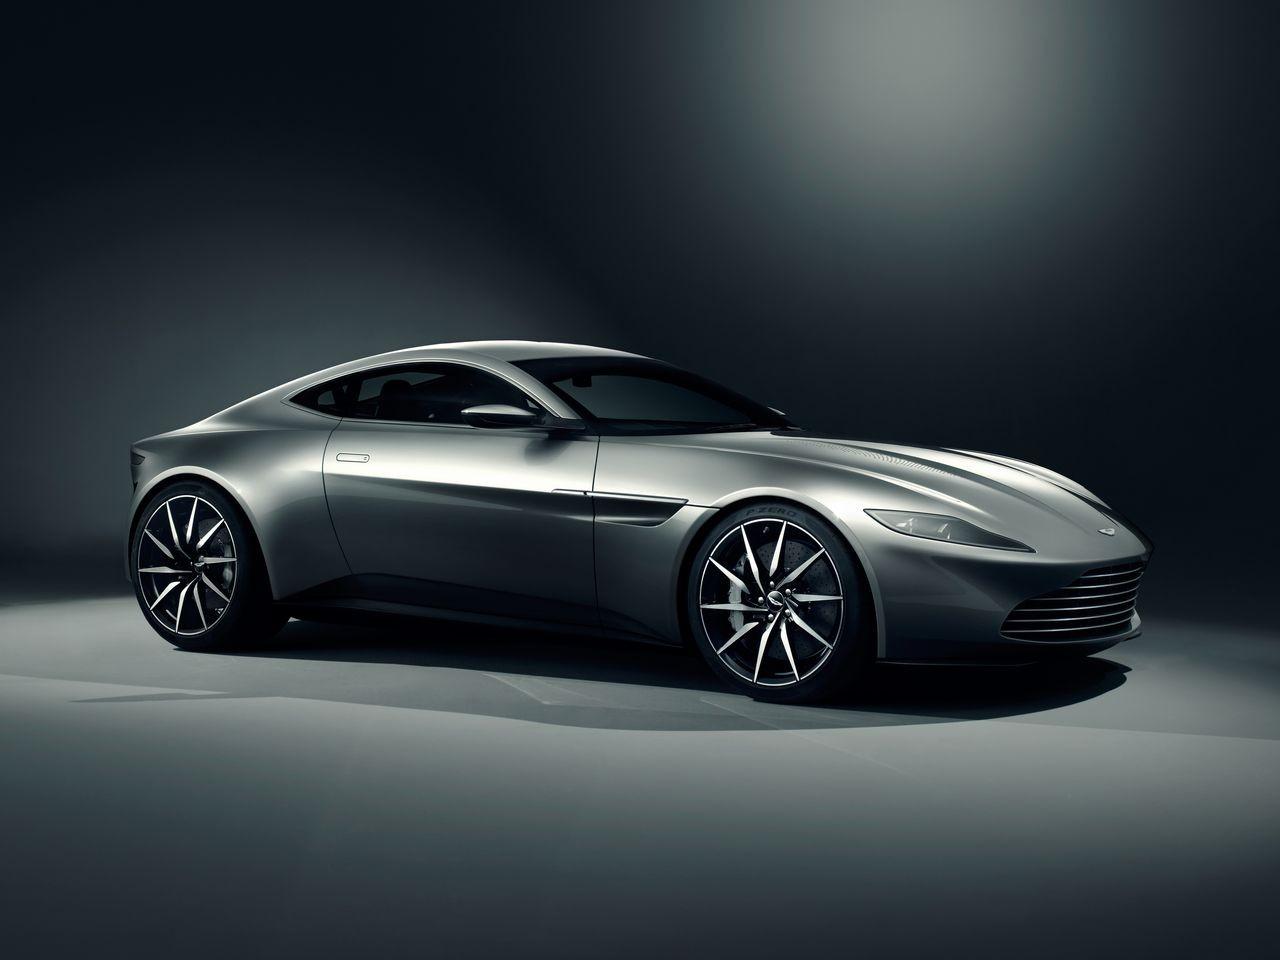 Aston-Martin DB10